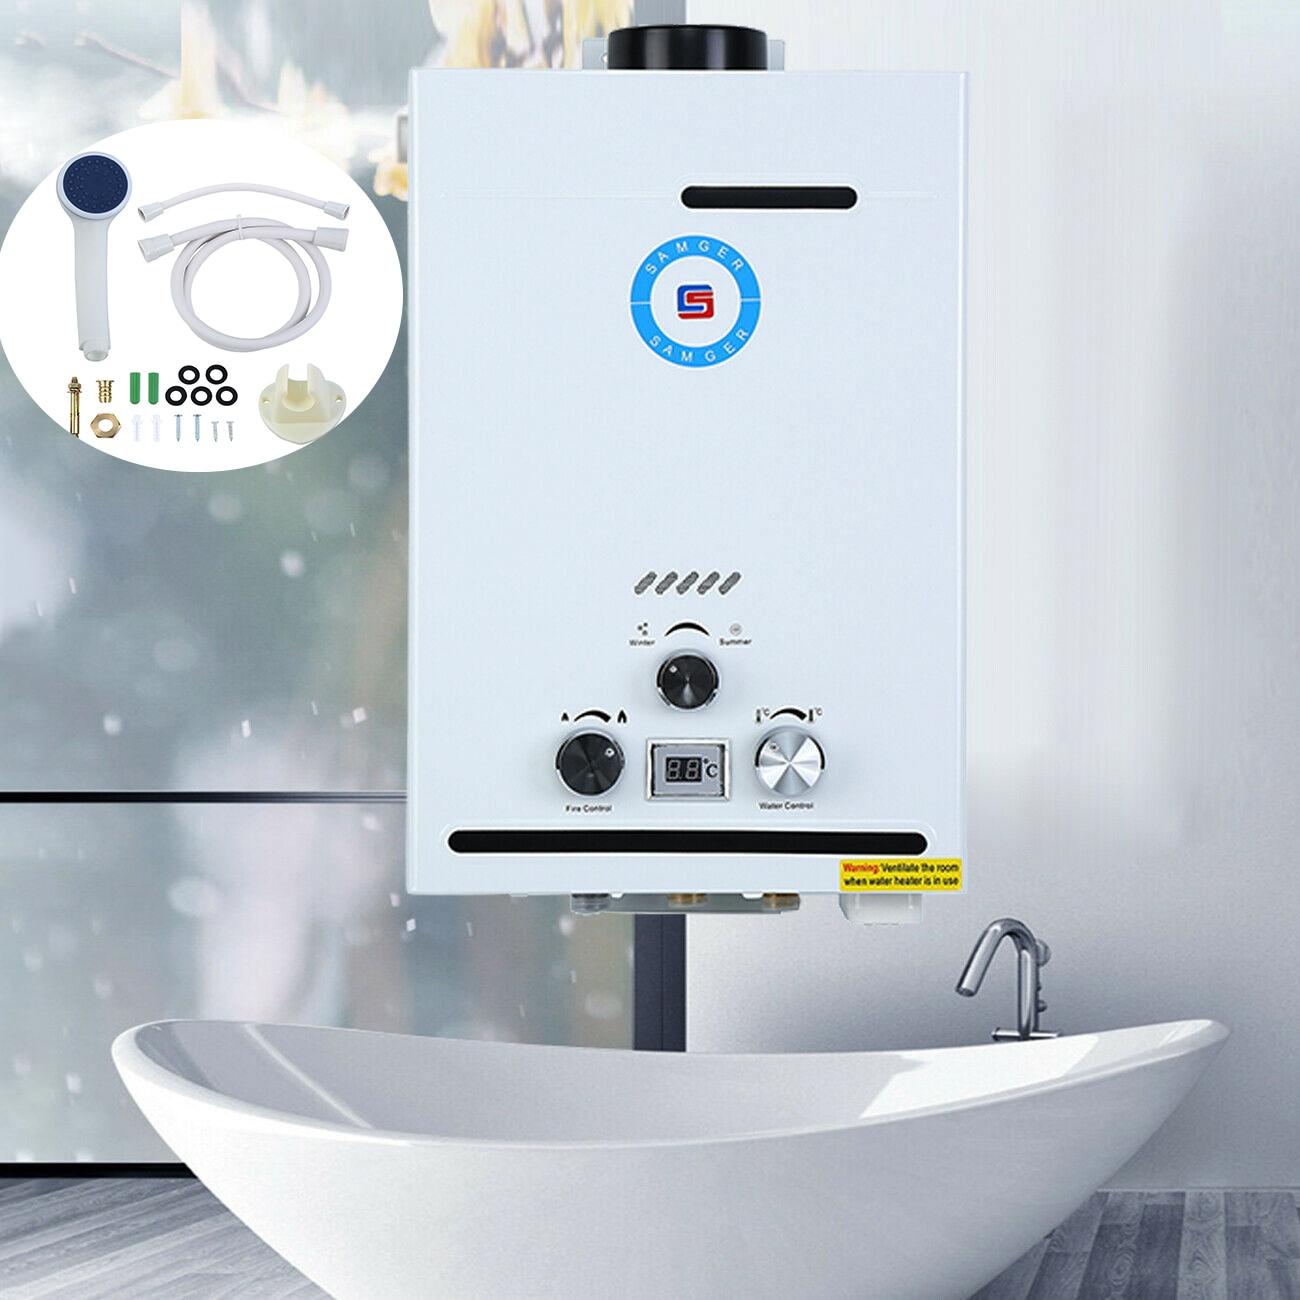 Honhill 8 L scaldabagno a Gas naturale 16KW caldaia a Gas istantanea con soffione doccia scaldabagno